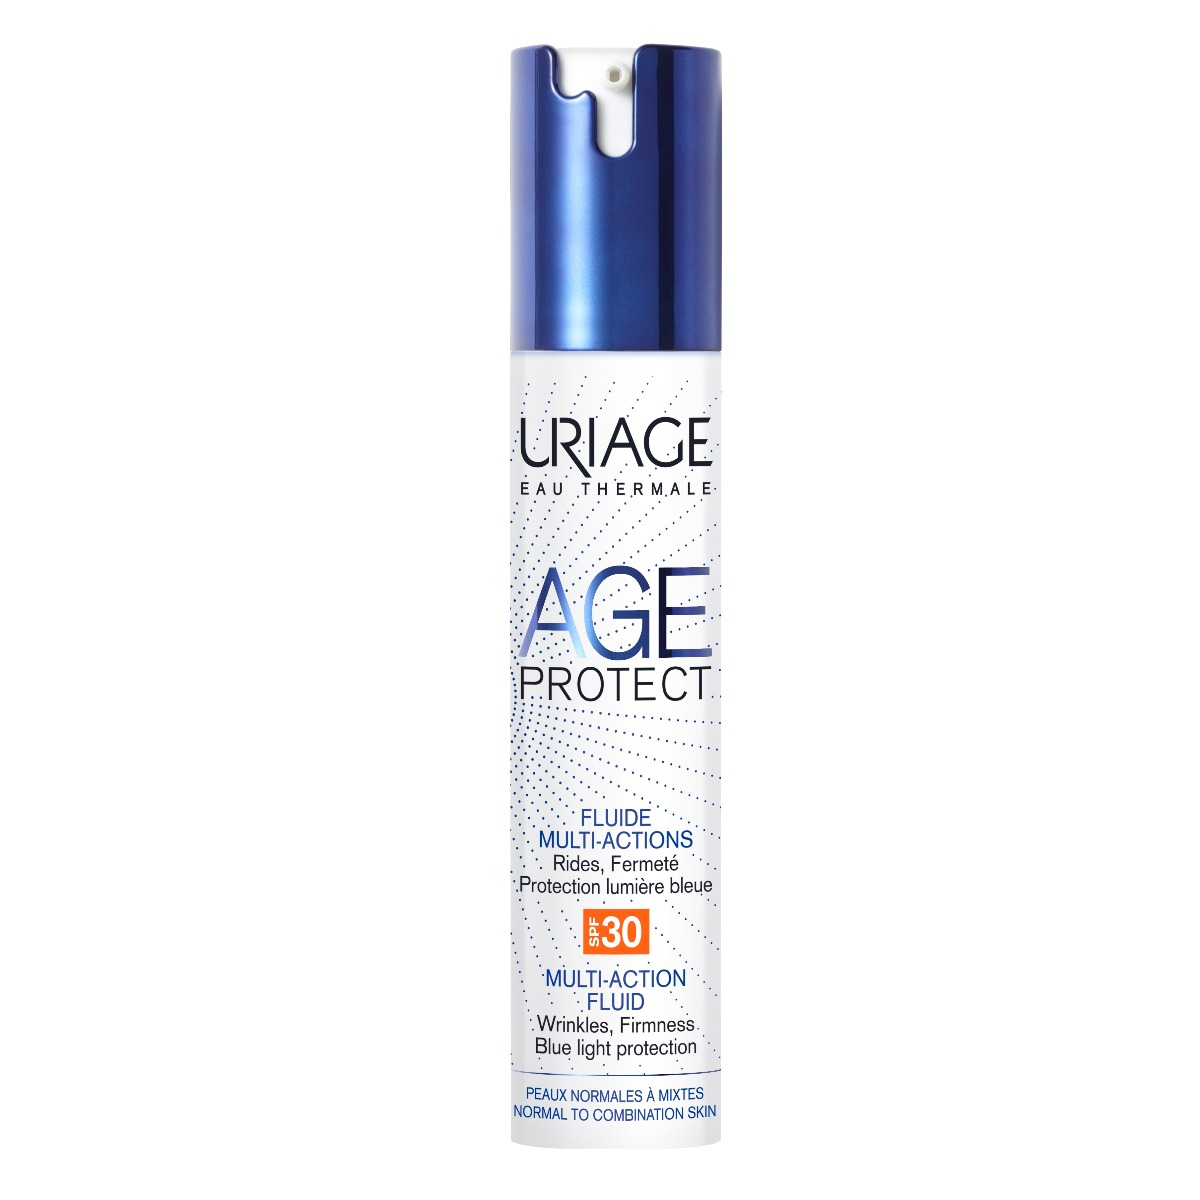 Fluid antiaging multi-action cu SPF 30 Age Protect, 40ml, Uriage imagine produs 2021